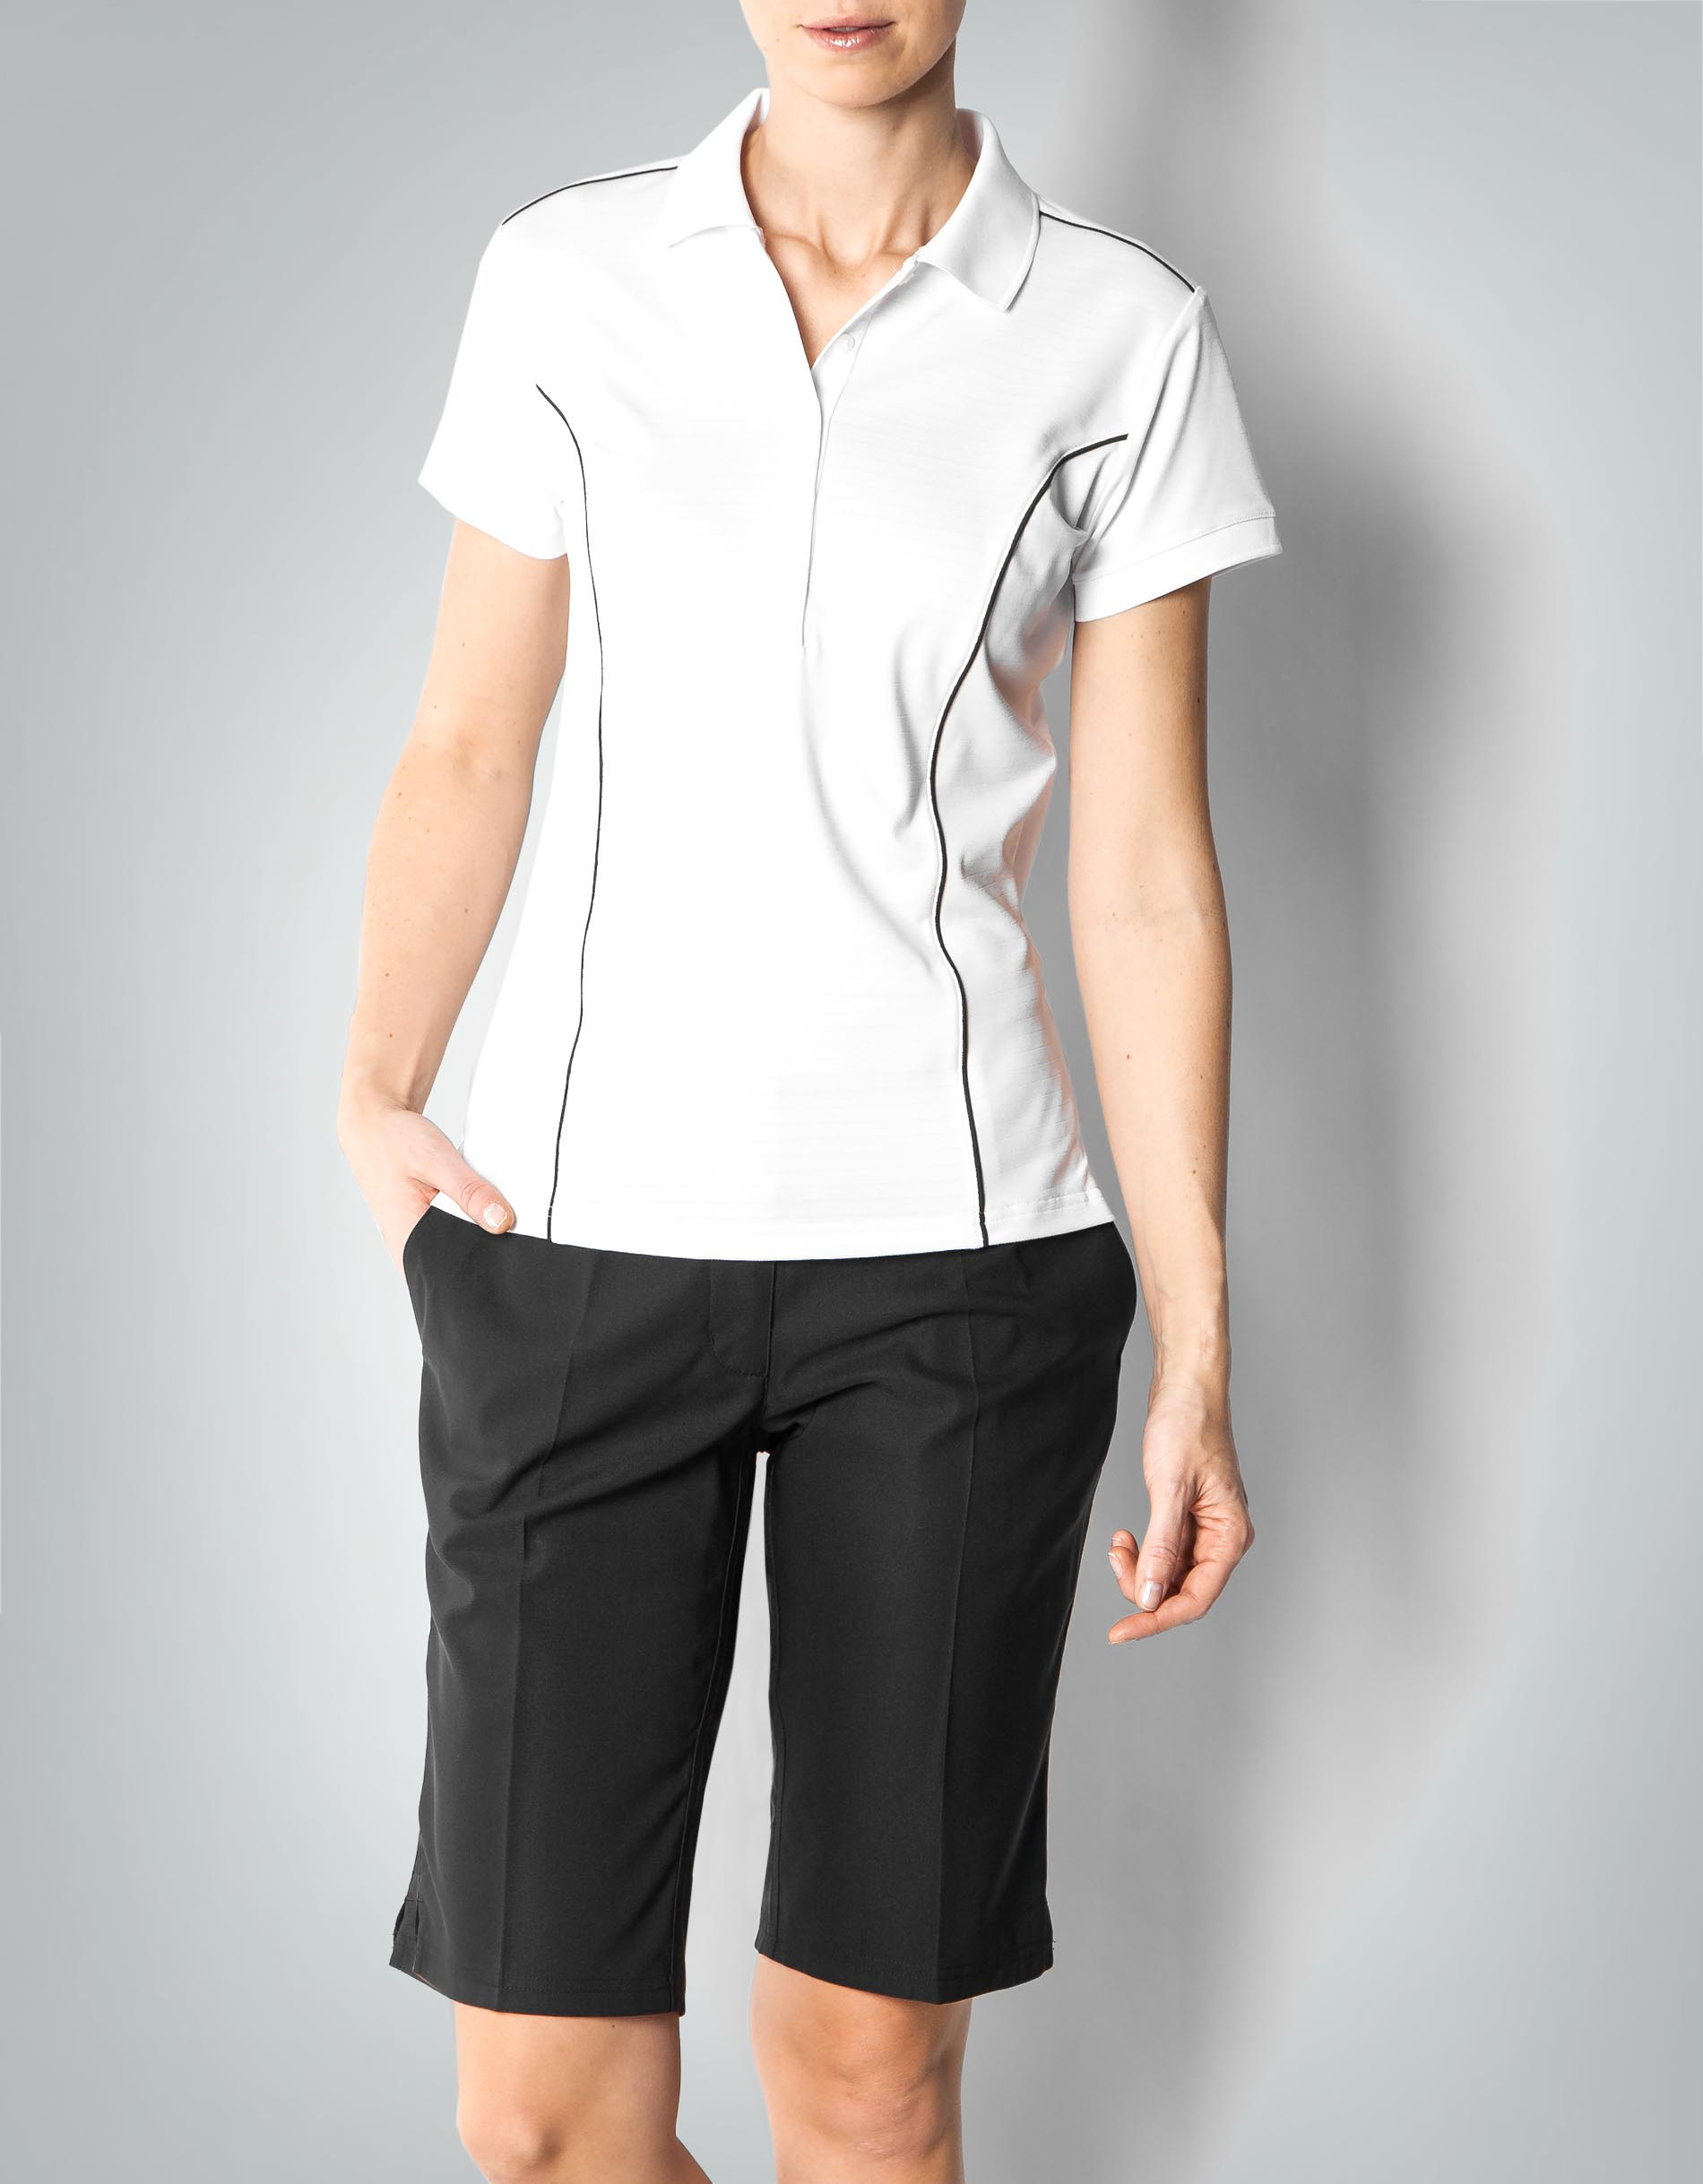 adidas golf damen polo shirt climalite aus funktionellem. Black Bedroom Furniture Sets. Home Design Ideas